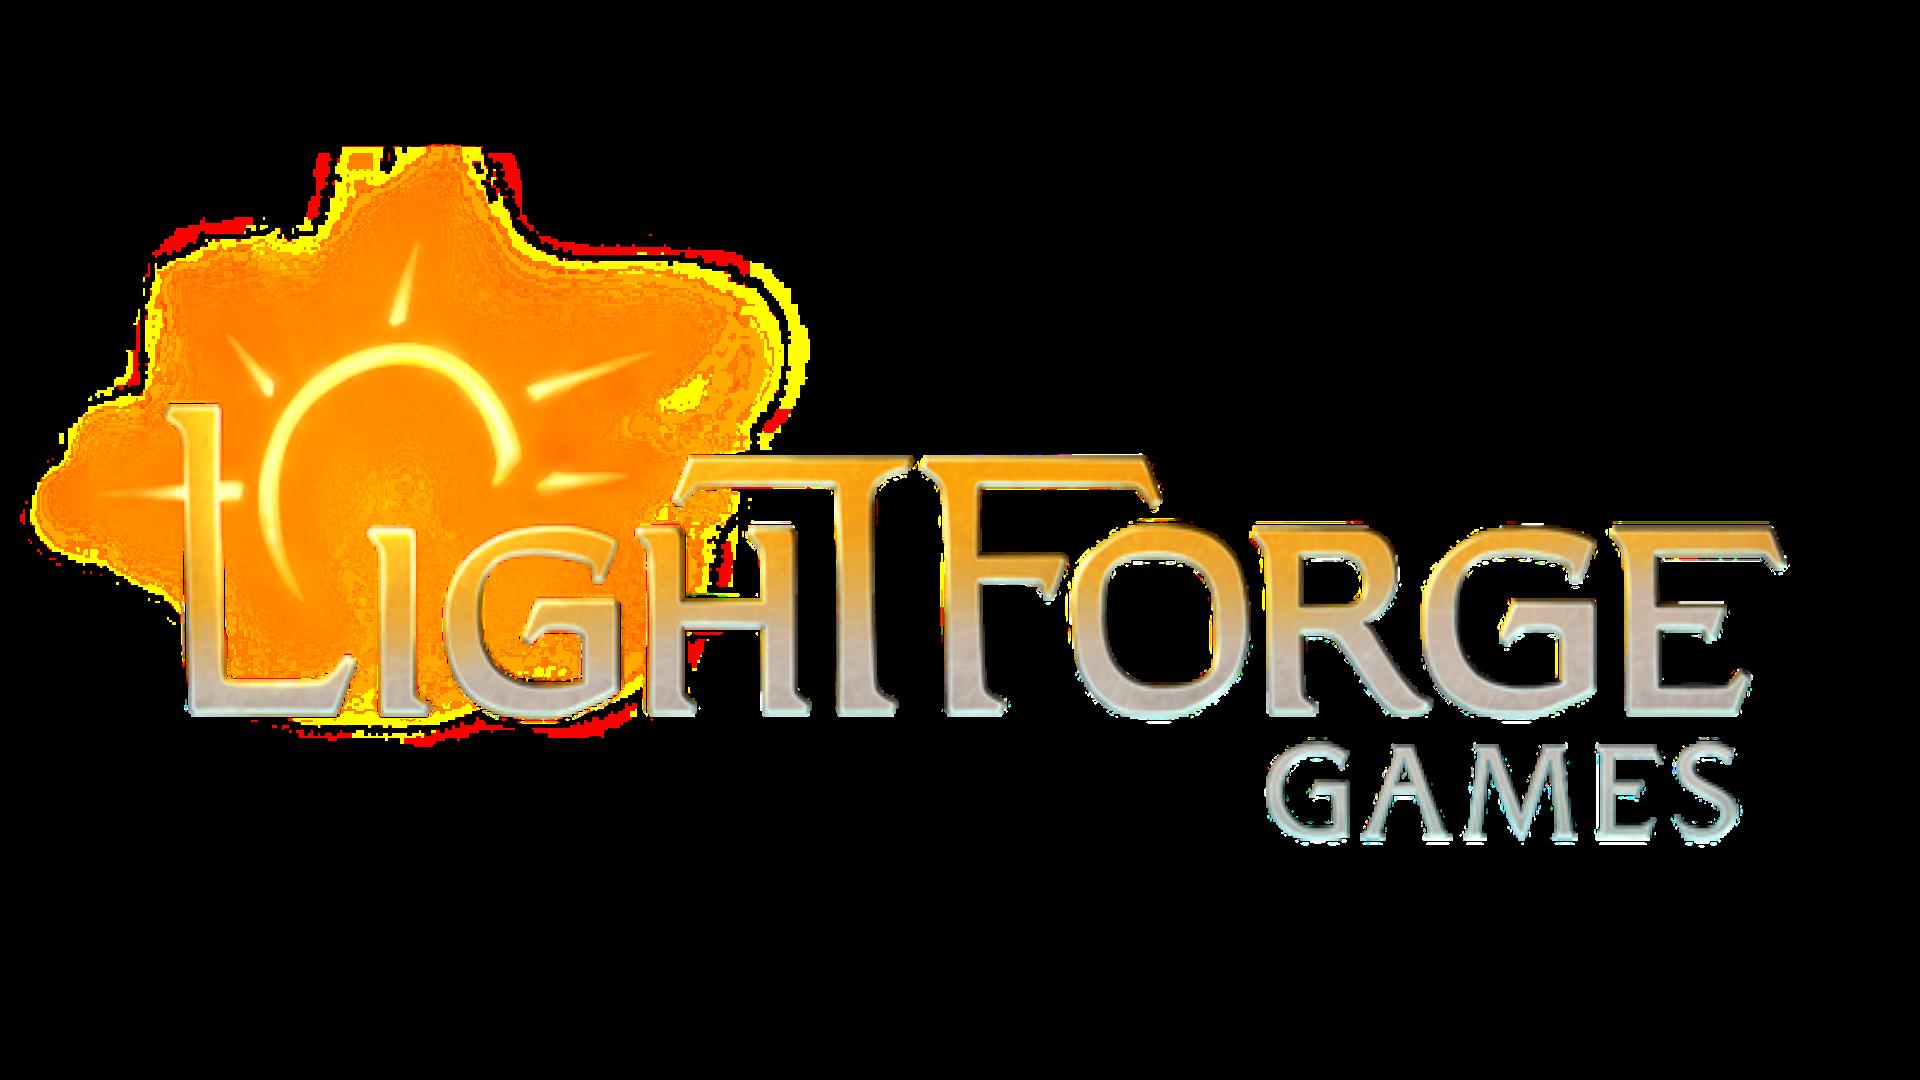 استودیو Lightforge Games